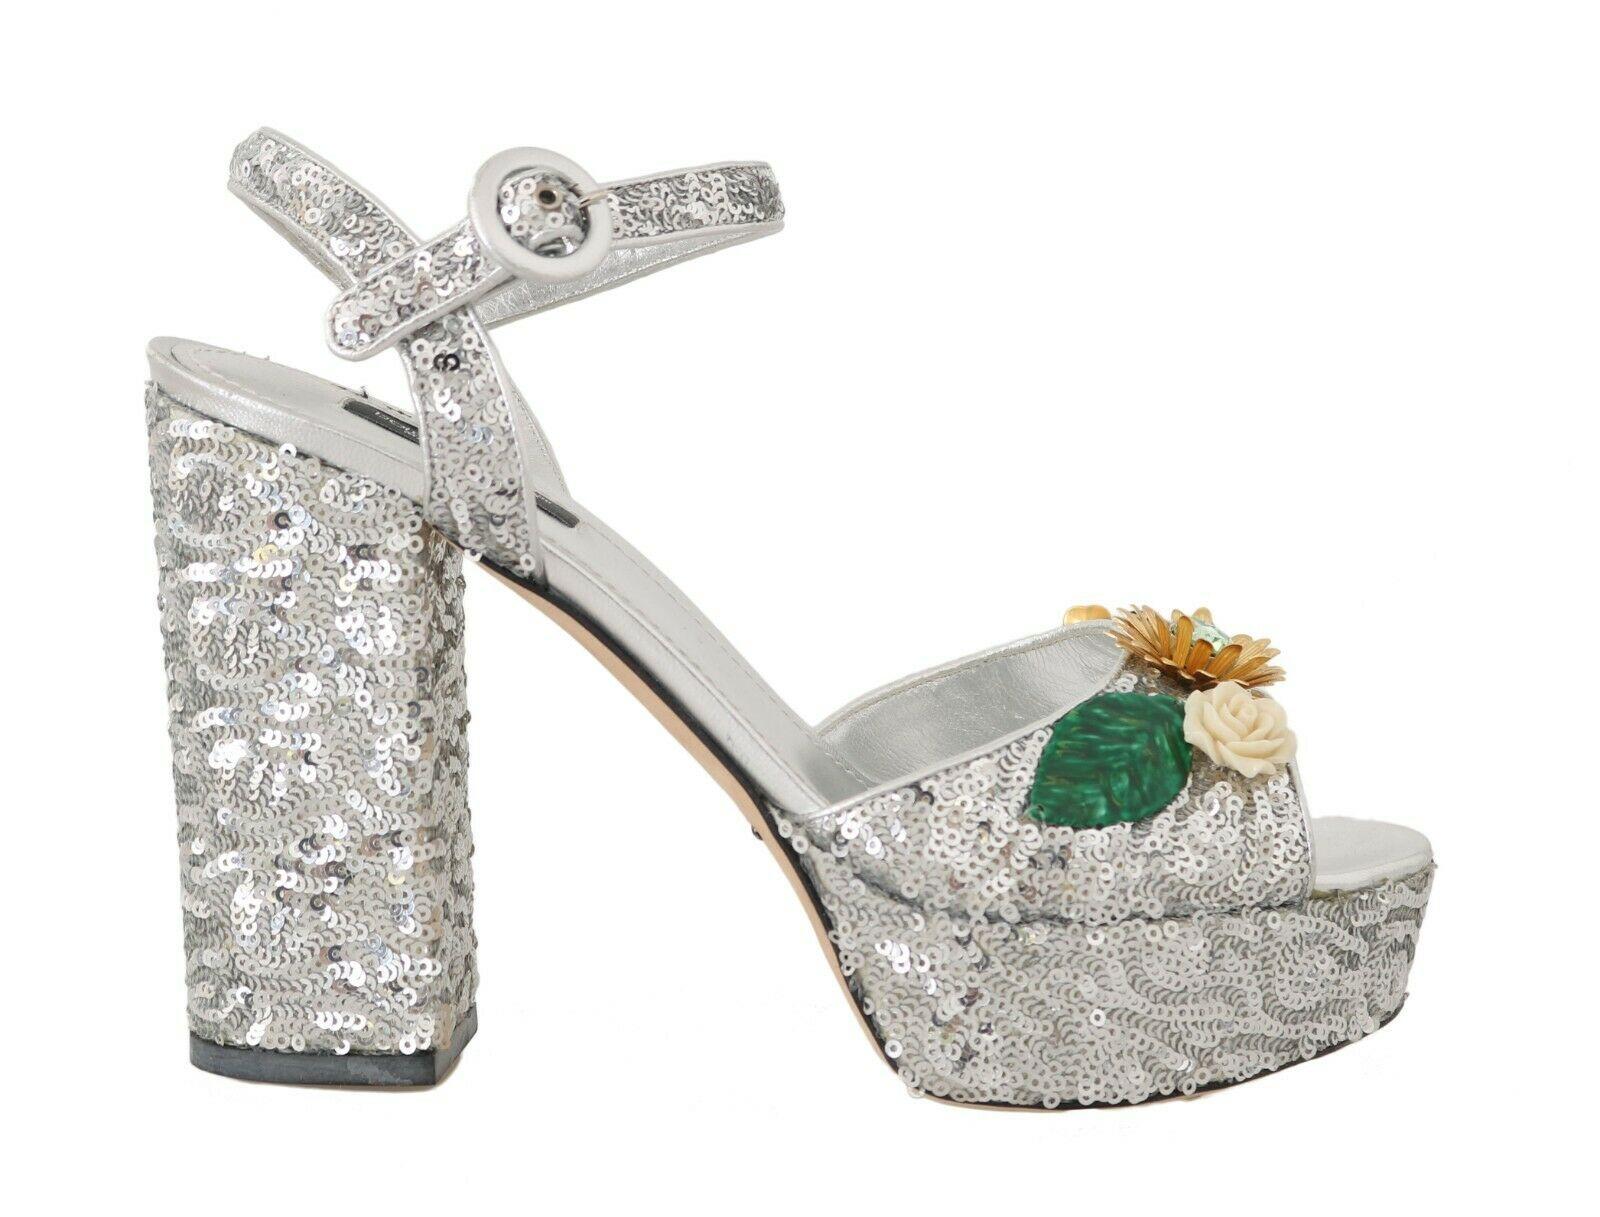 Dolce & Gabbana Women's Leather Sequin Crystal Sandals Silver LA5694 - EU36/US5.5